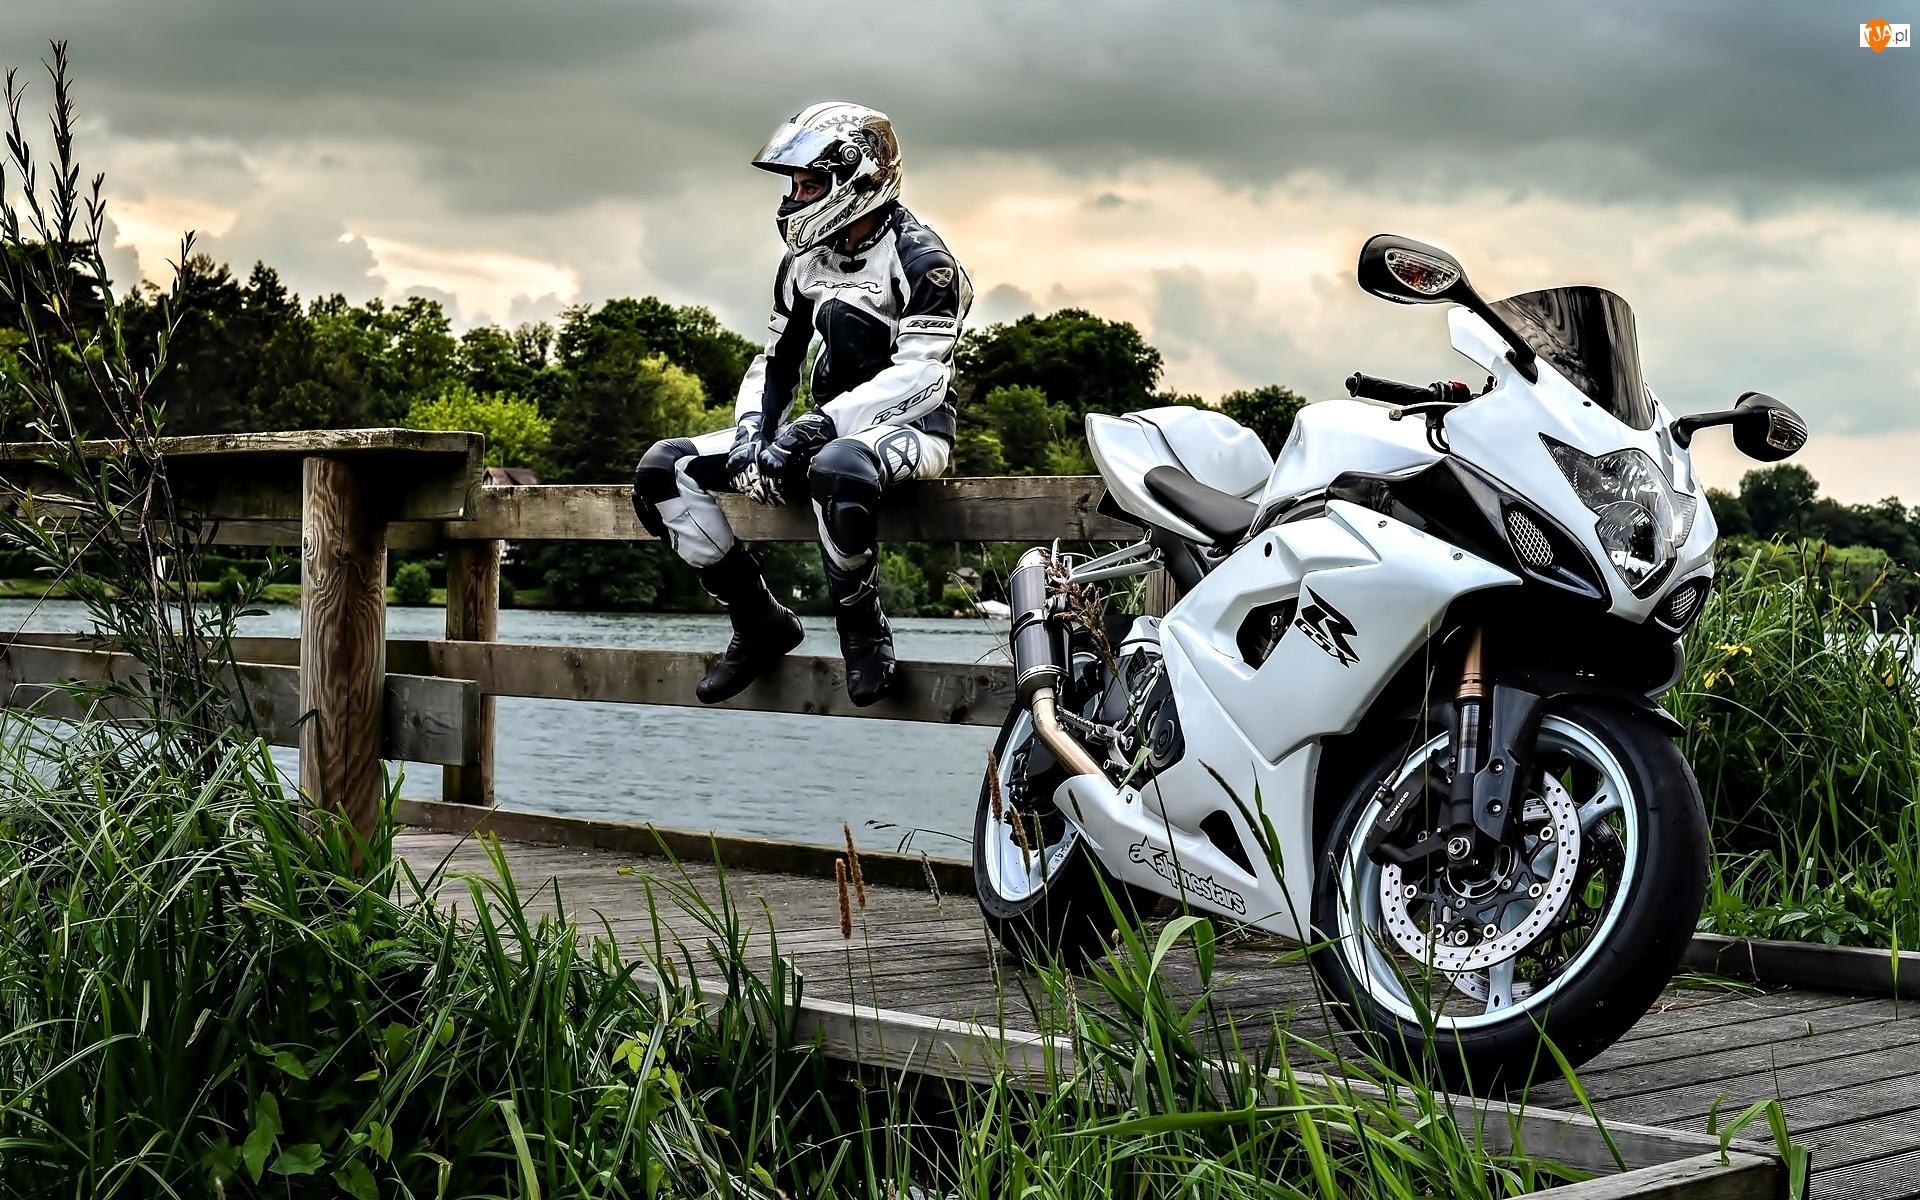 GSX-R 1000, Most, Motocykl, Zieleń, Suzuki, Motocyklista